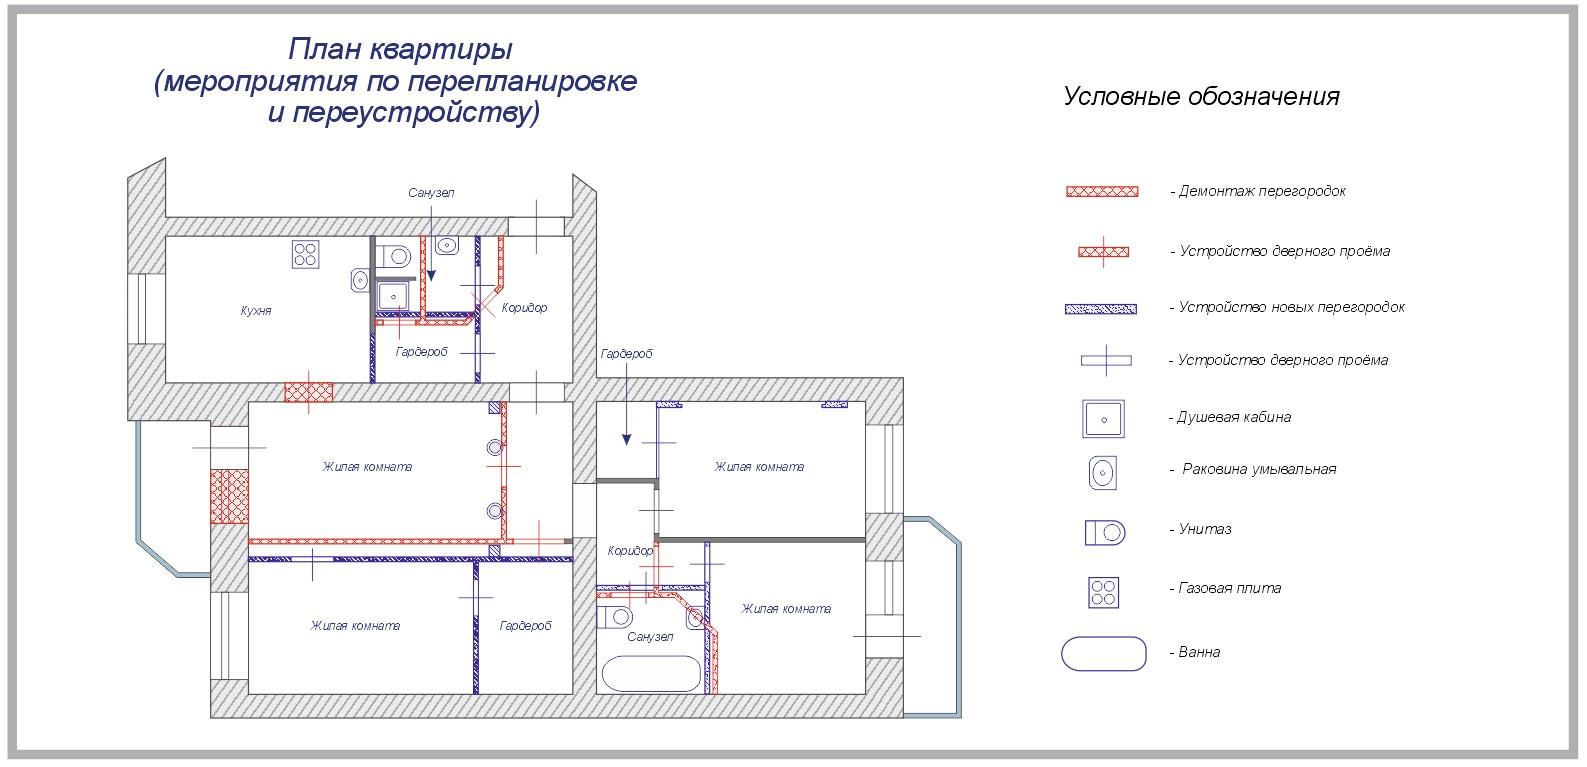 Дизайн однокомнатной квартиры 40 кв м, а так же